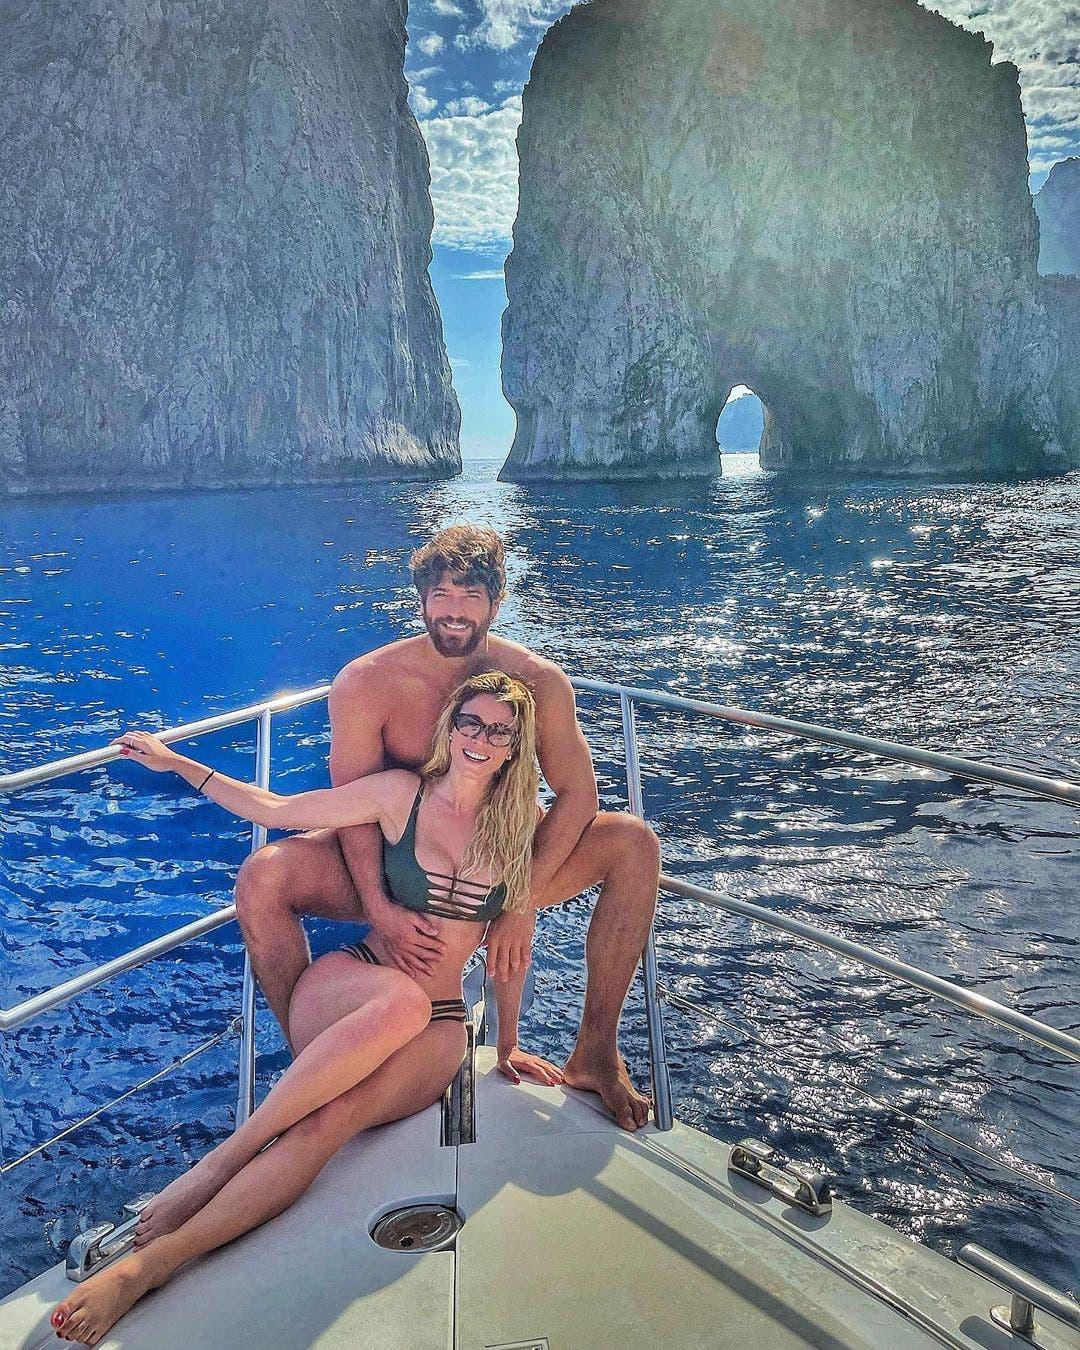 wedding august Diletta Leotta Flies to Turkey to Meet Can Yaman's Family famiglia aile